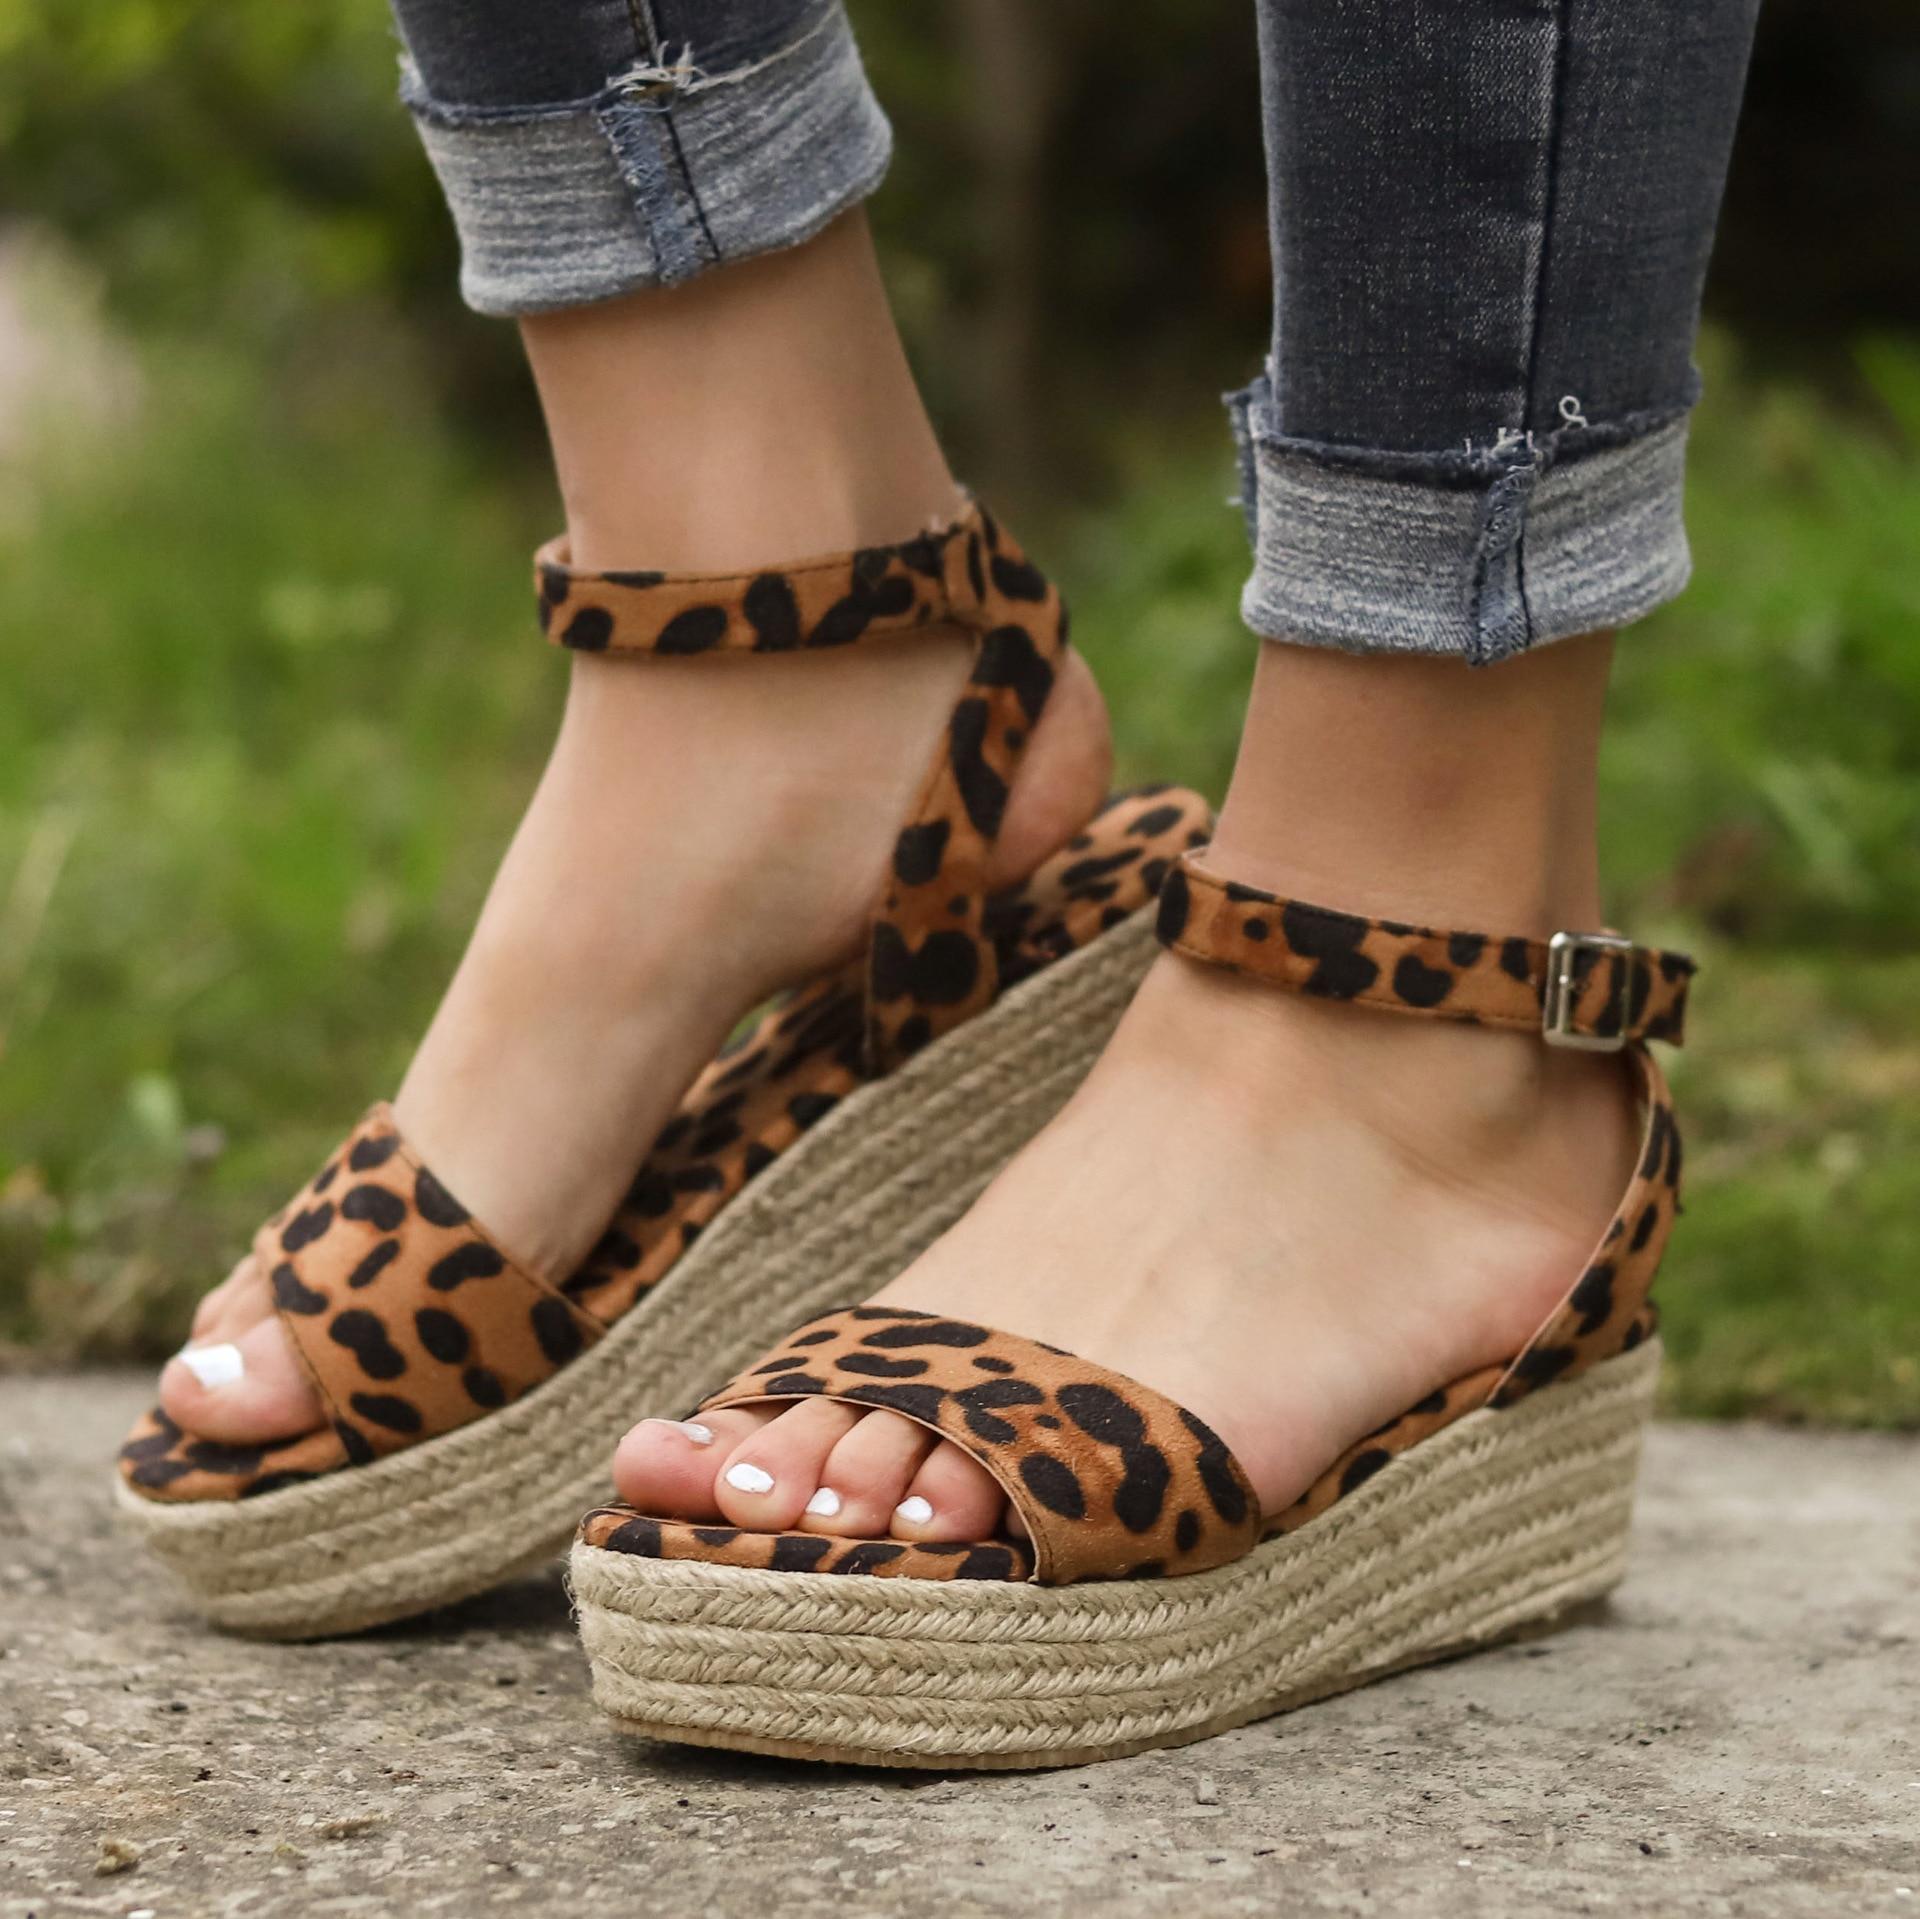 Platform Sandals Wedges-Shoes Peep-Toe Fashion Woman Casual 569